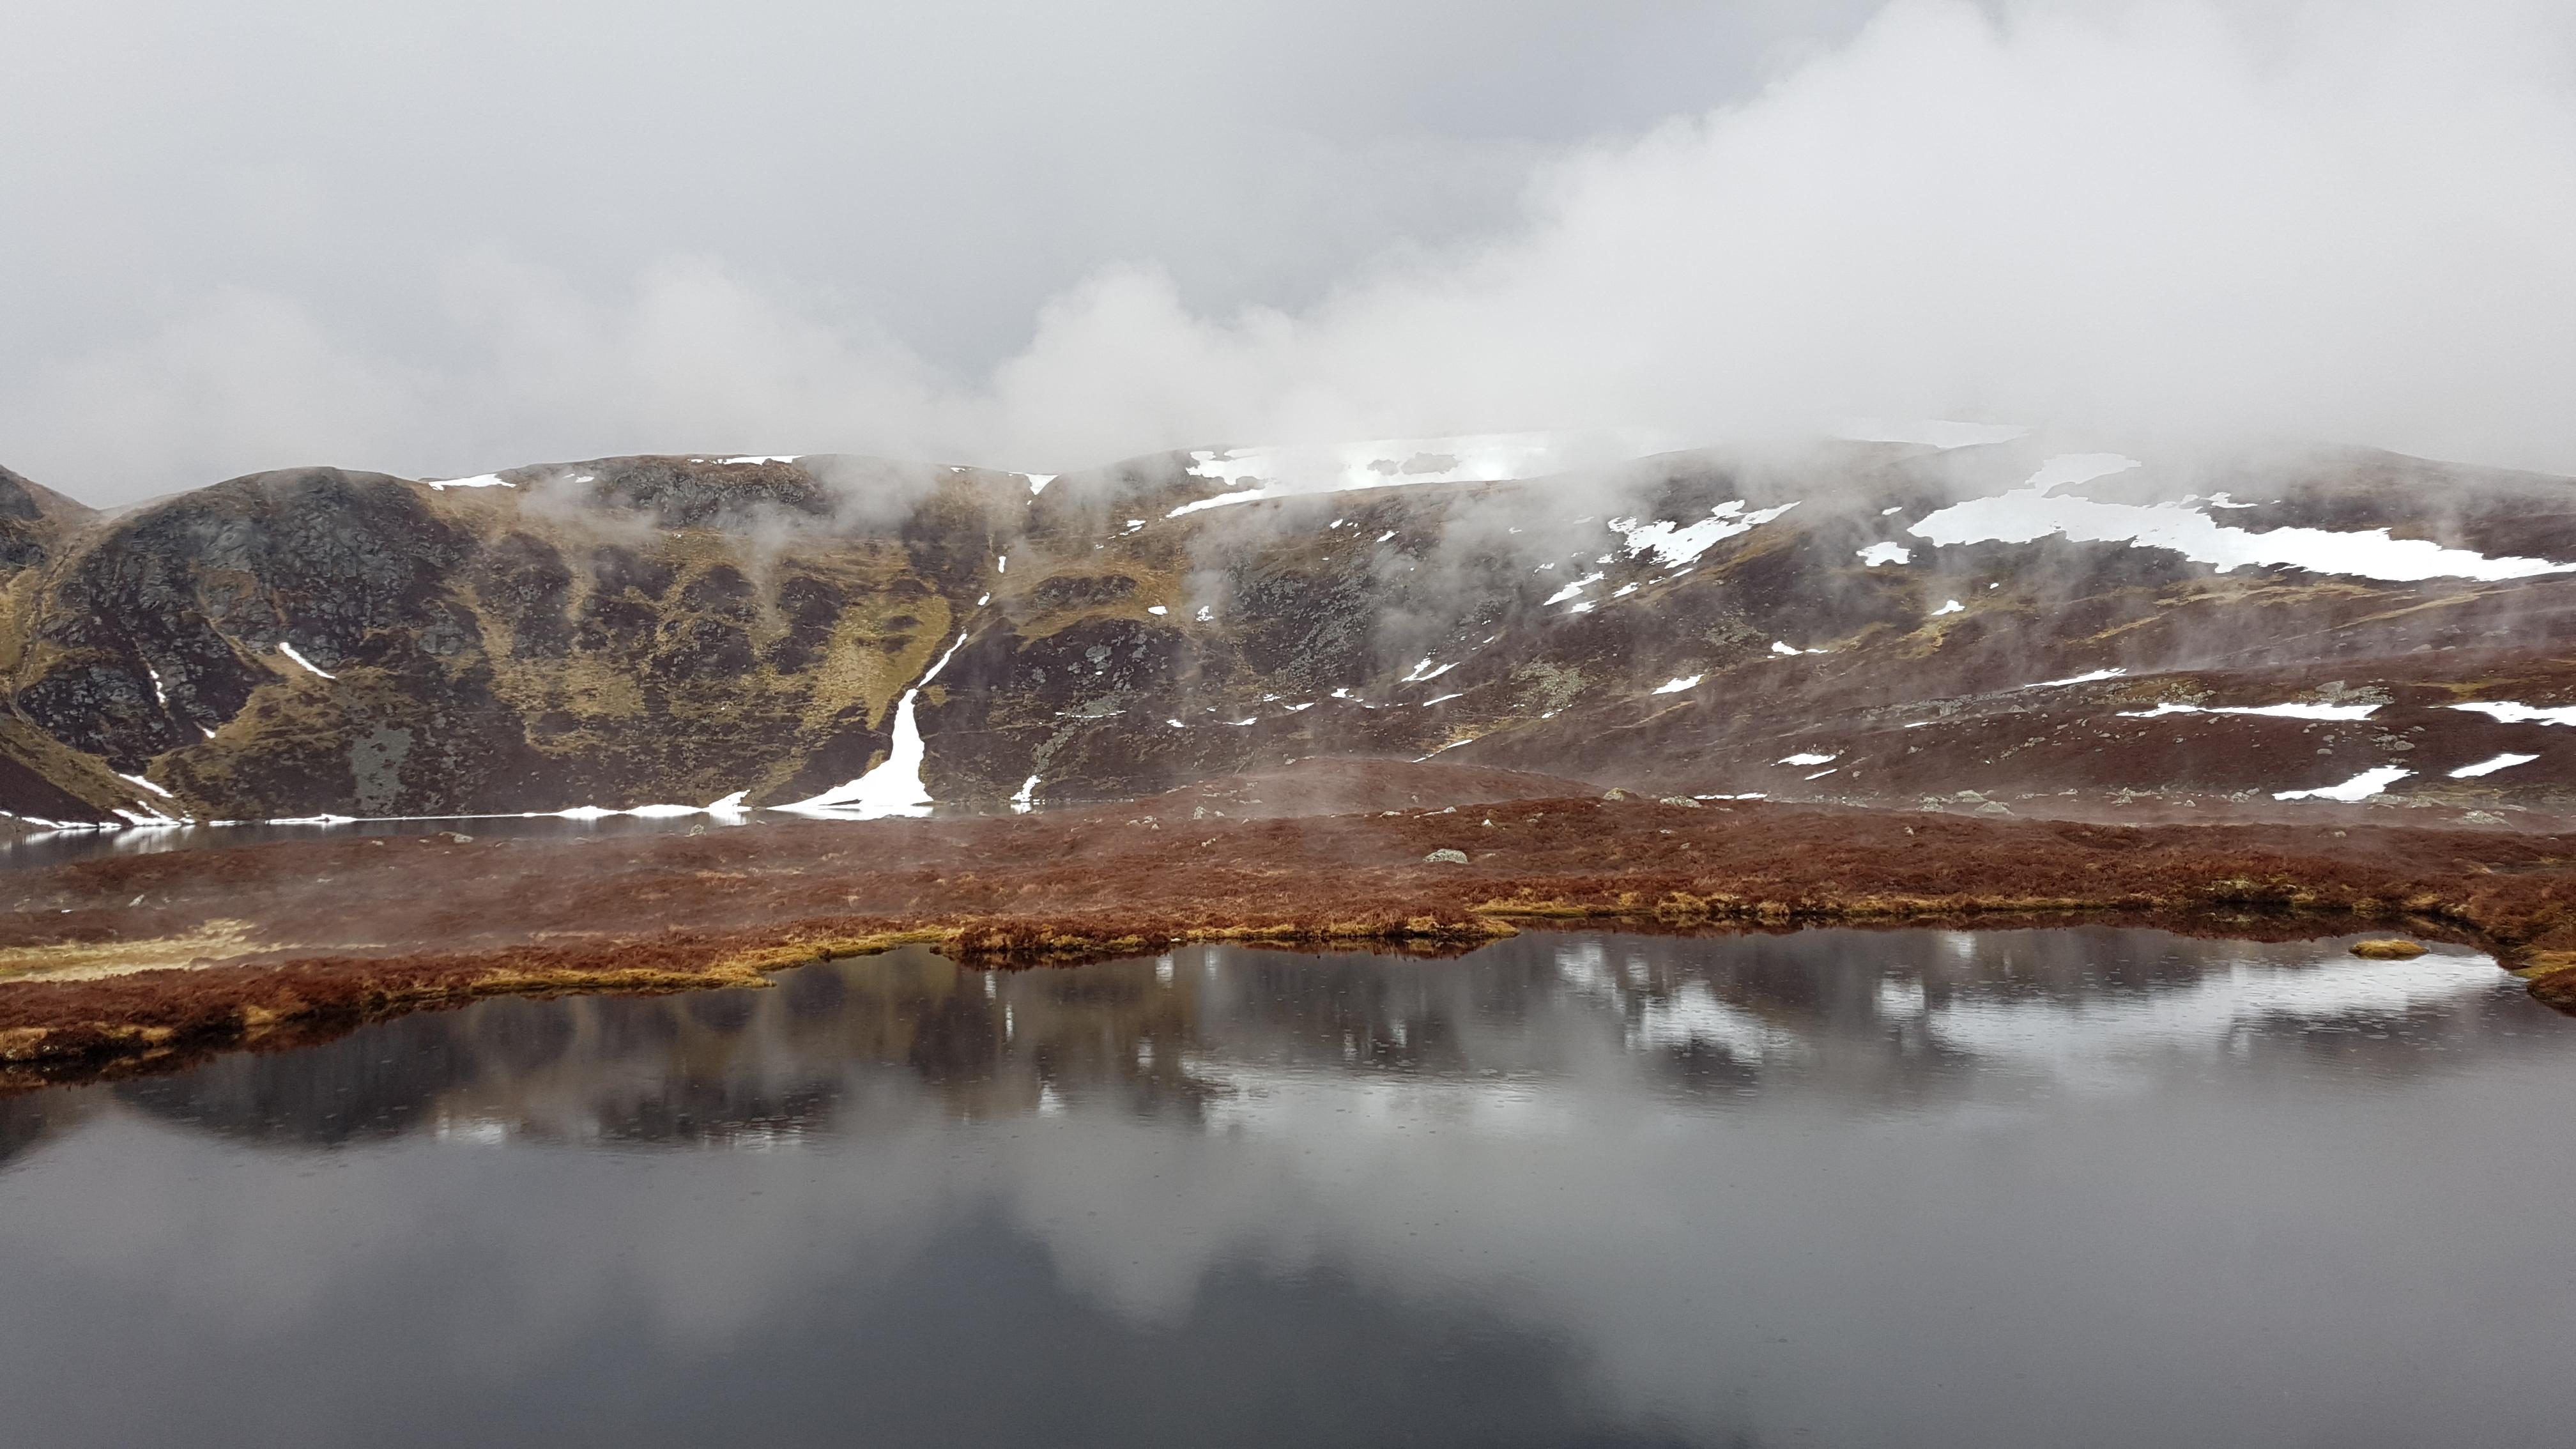 Field Report: Loch Brandy 20180428_152450